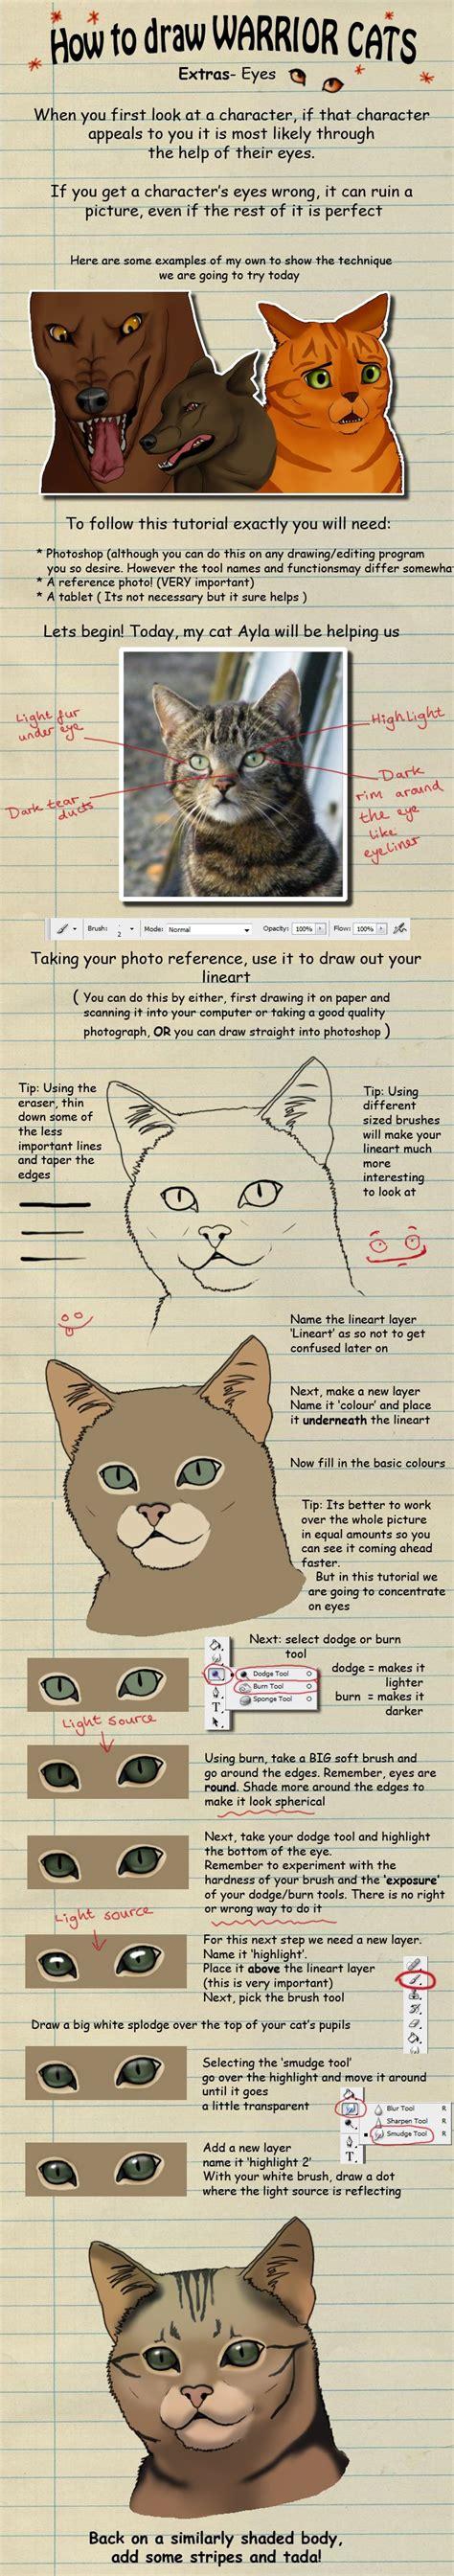 warrior cats images  pinterest